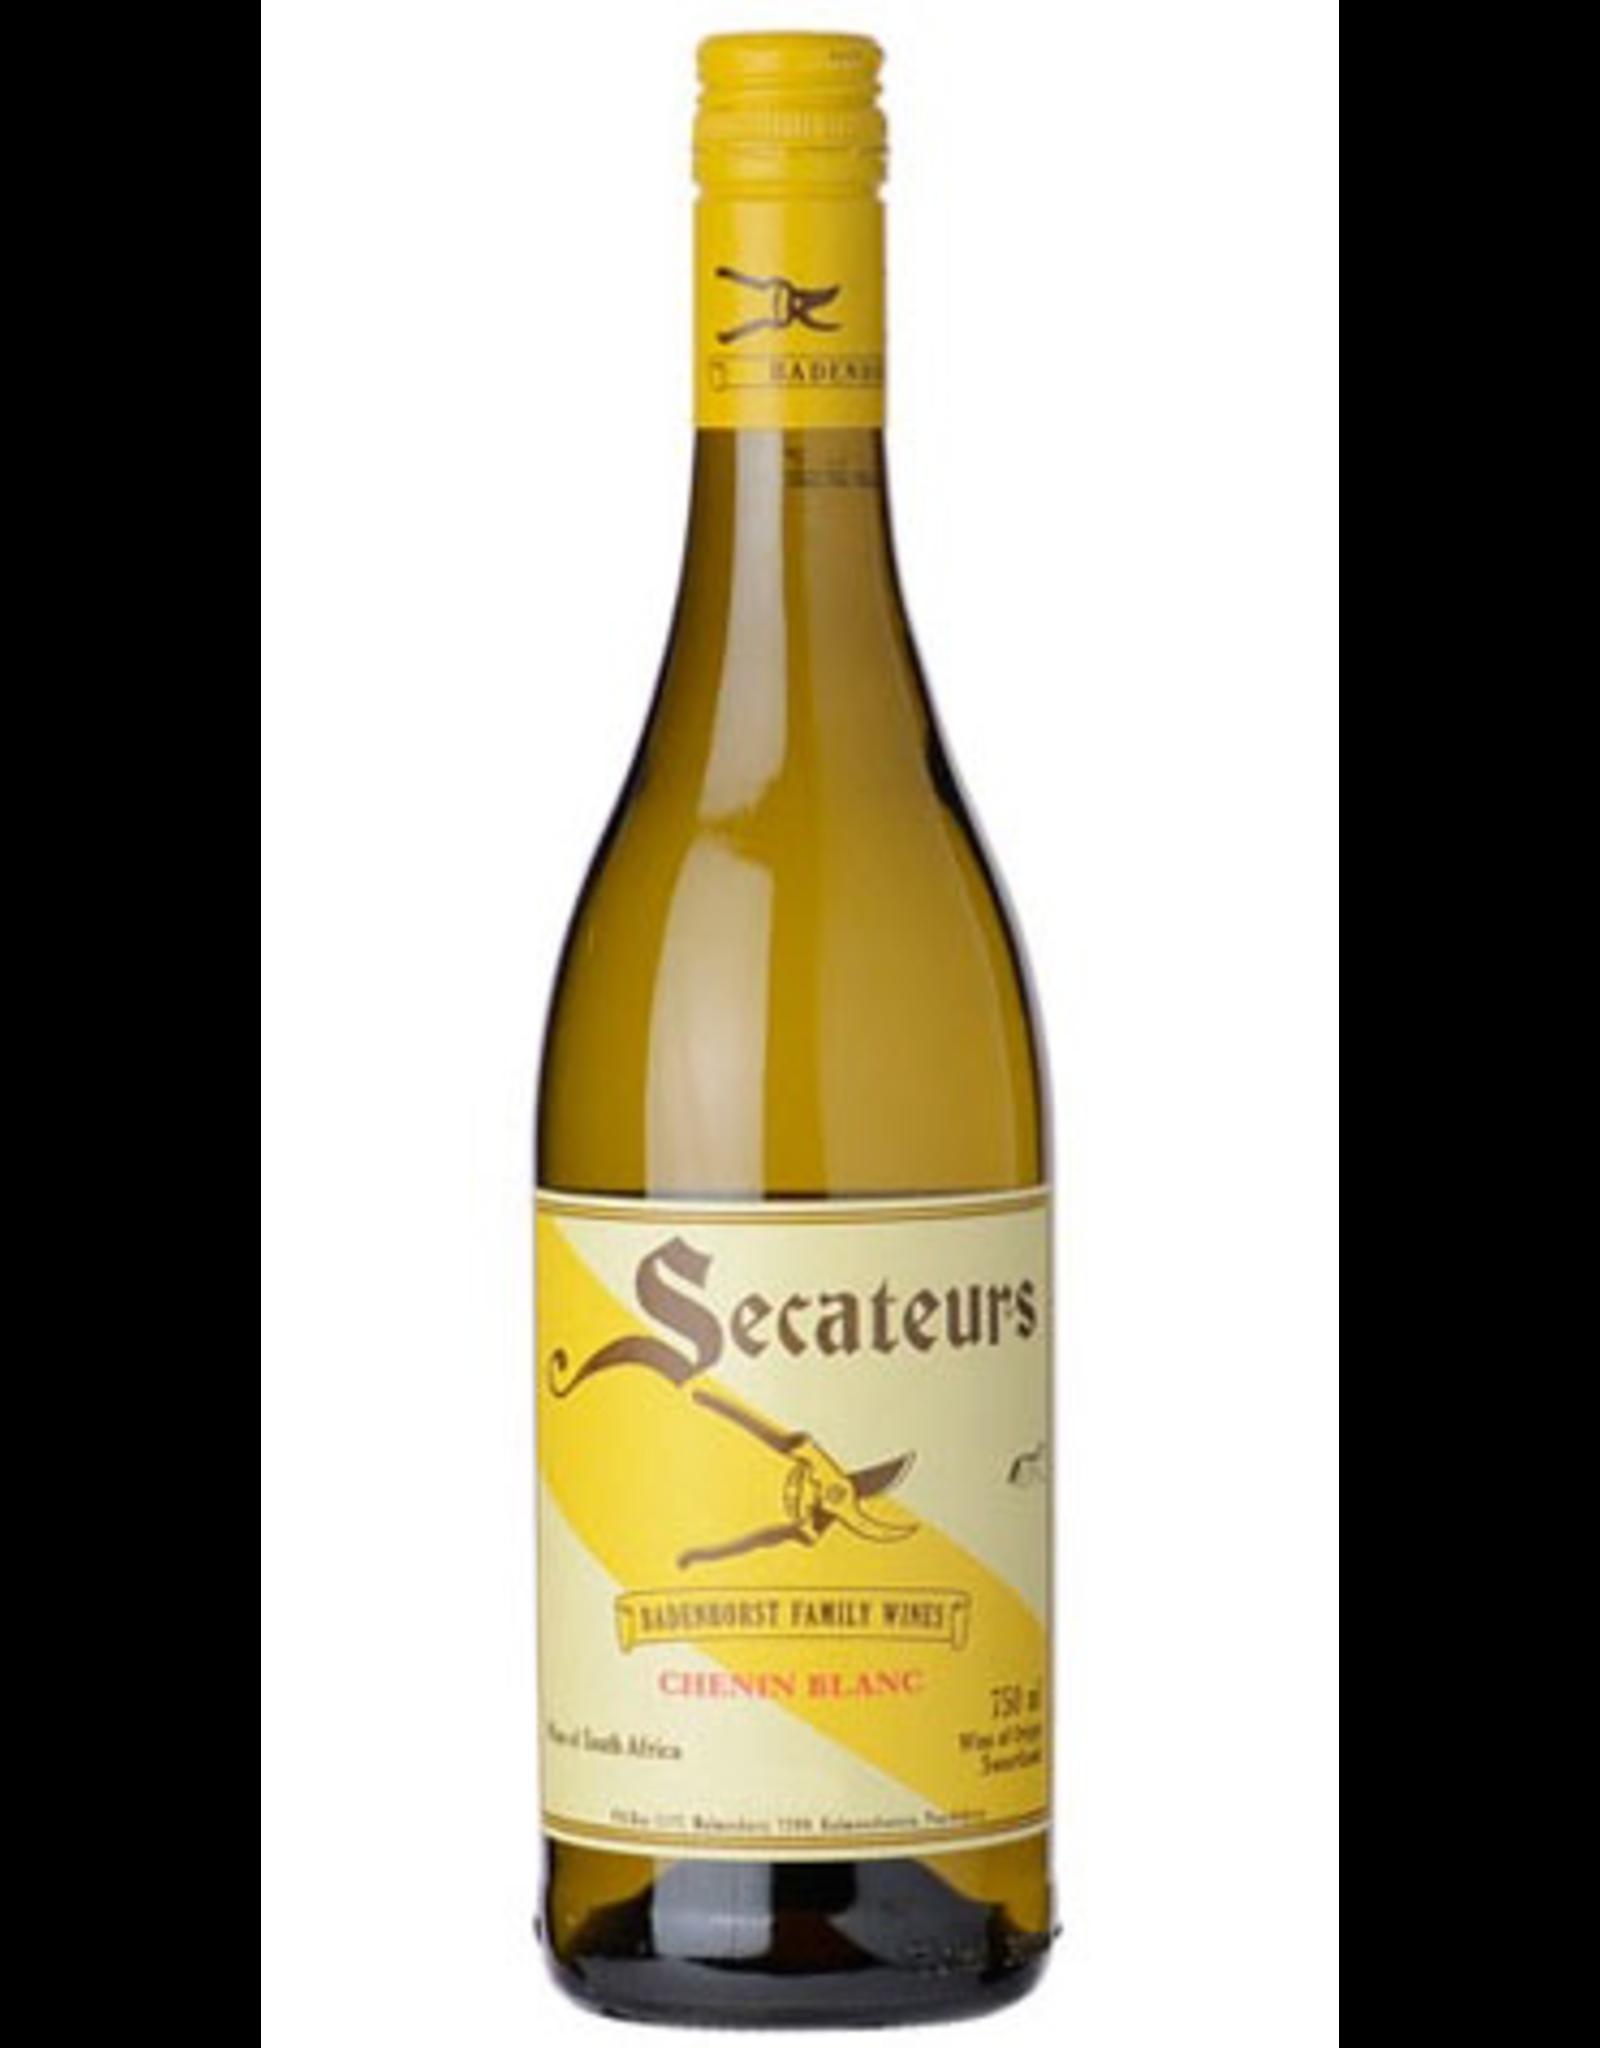 White Wine 2019, A.A. Badenhorst Family Wines Secateurs, Chenin Blanc, Swartland, Coastal Region, South Africa, 13.5% Alc, CT88, TW92